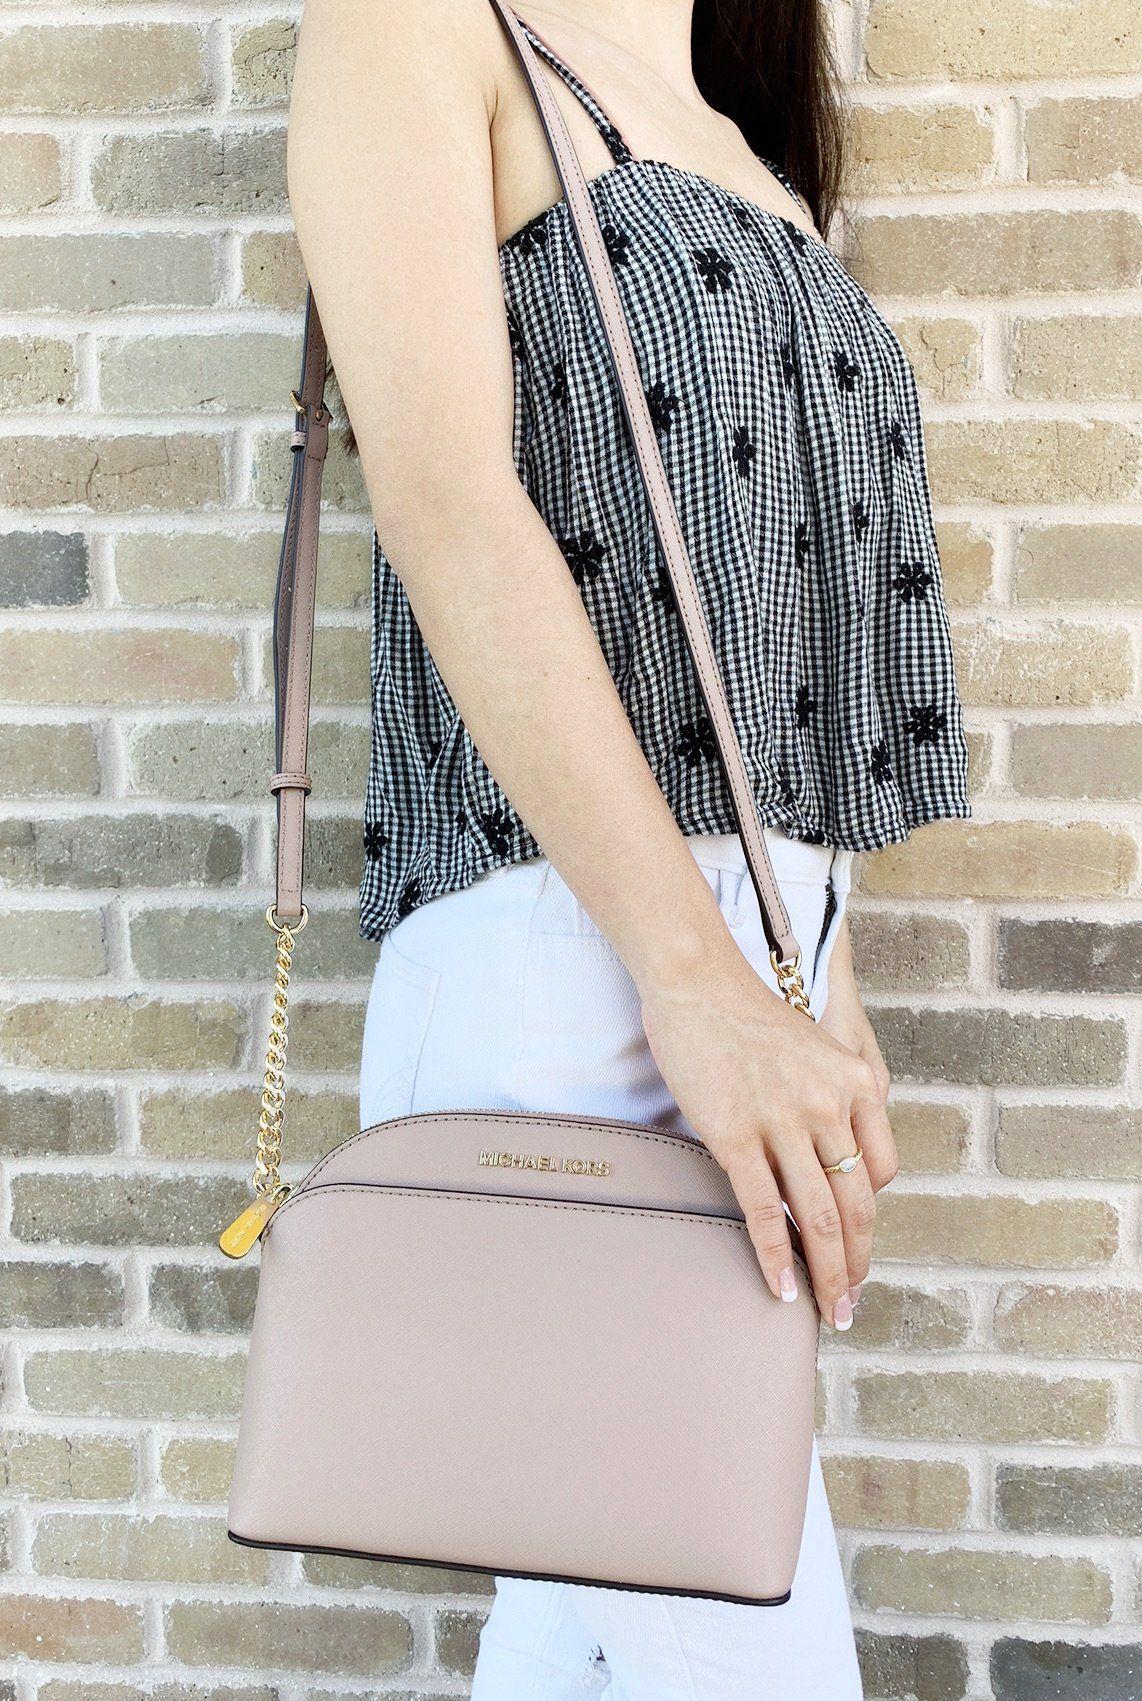 74b1a61cb2ce Michael Kors Emmy Small Cindy Dome Crossbody Fawn #MK #mercari  #amazonfashion #ebaycommunity #ebaybusiness #ebayreseller #mercariseller  #amazon #Handbags # ...